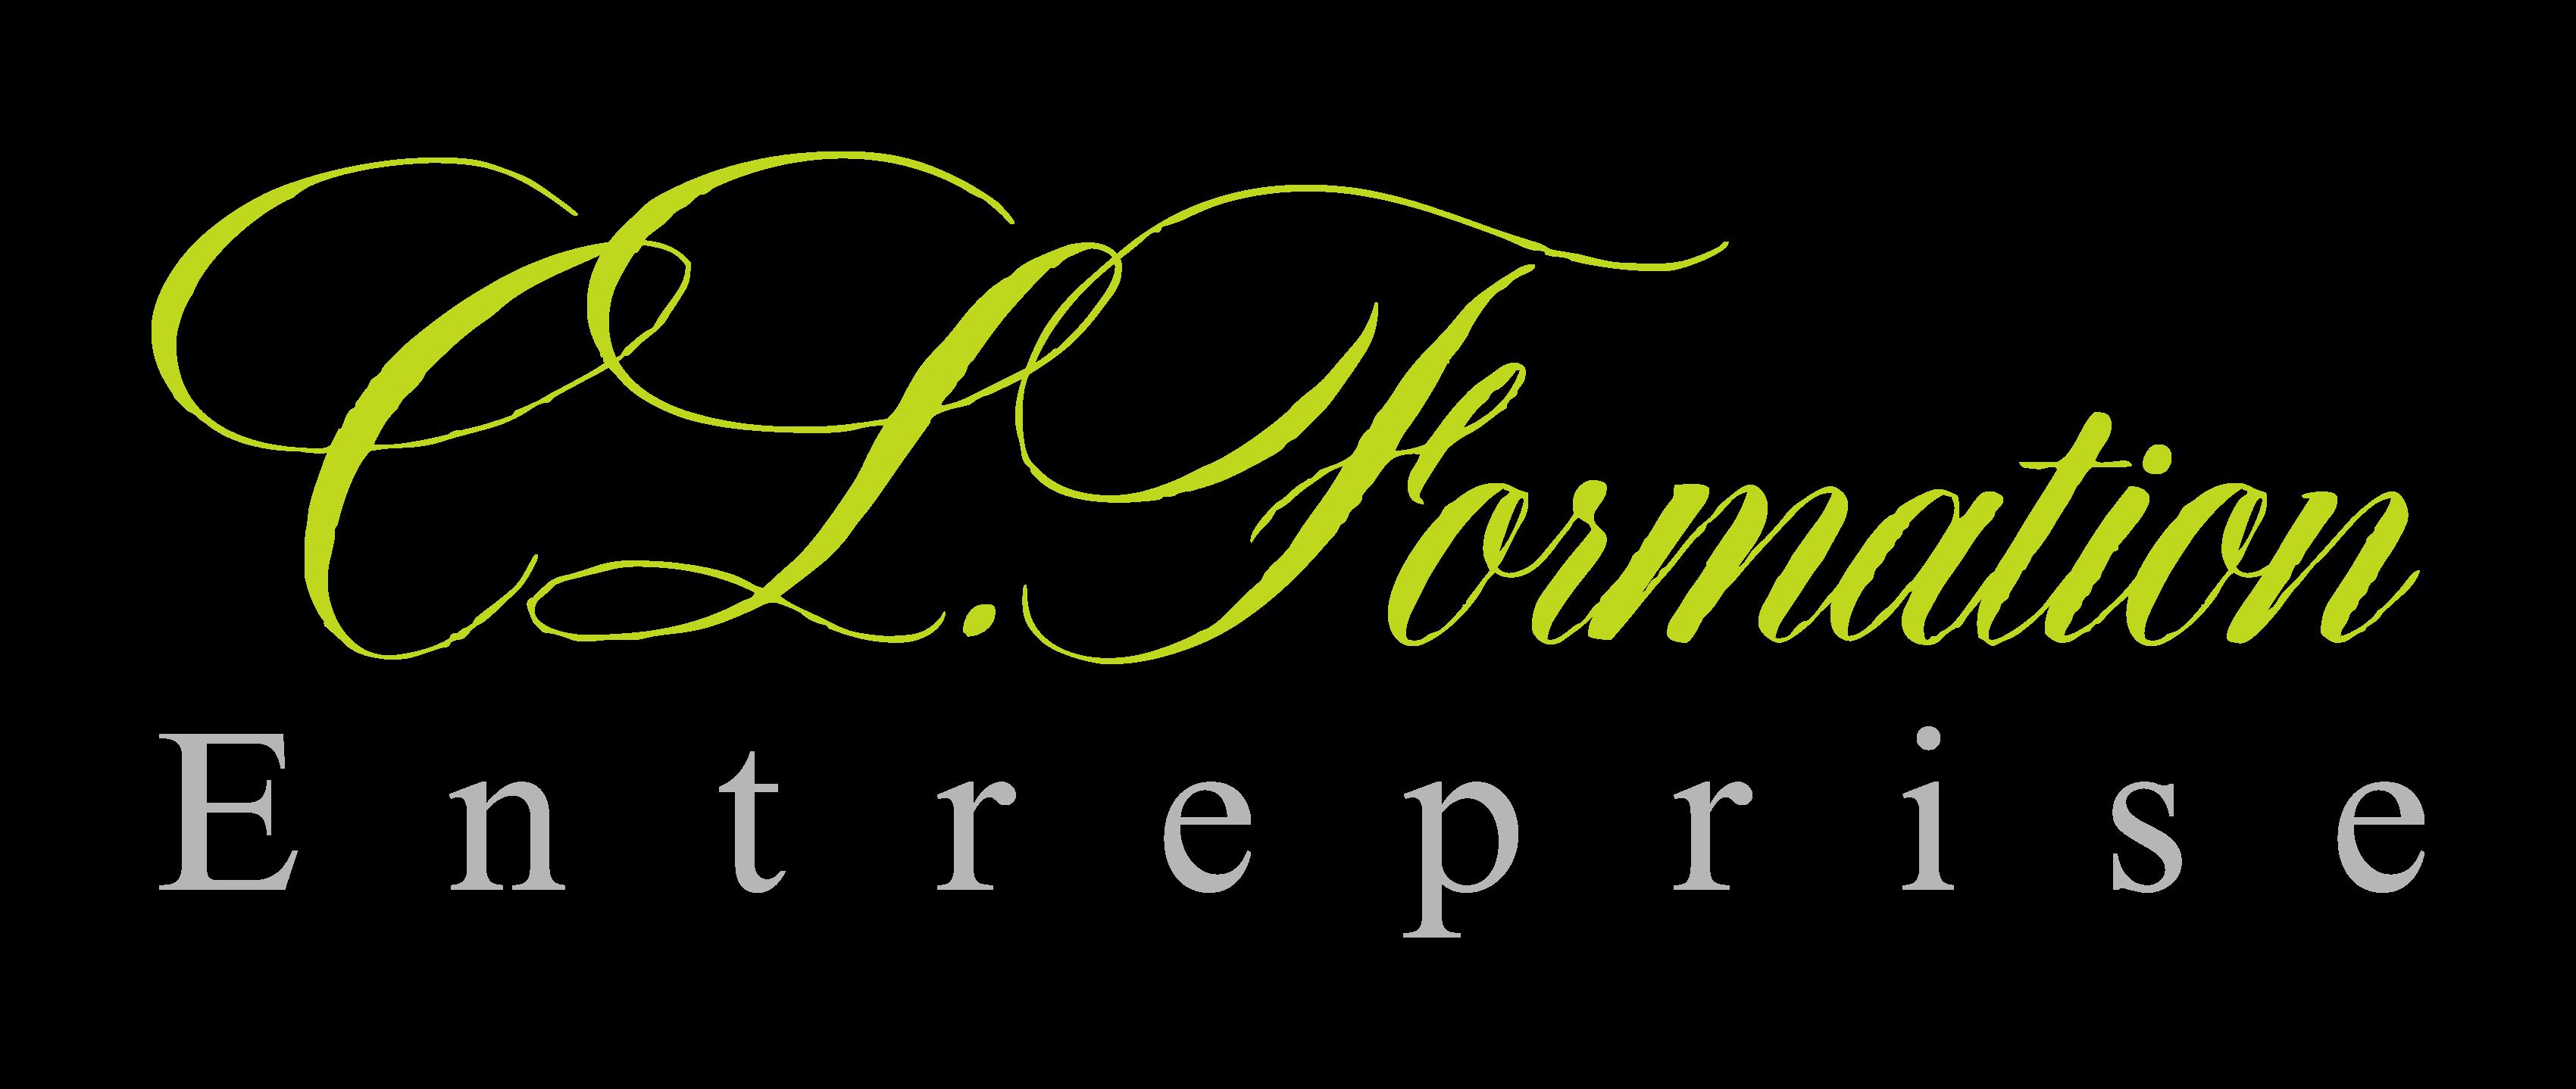 CL. Formation Entreprise